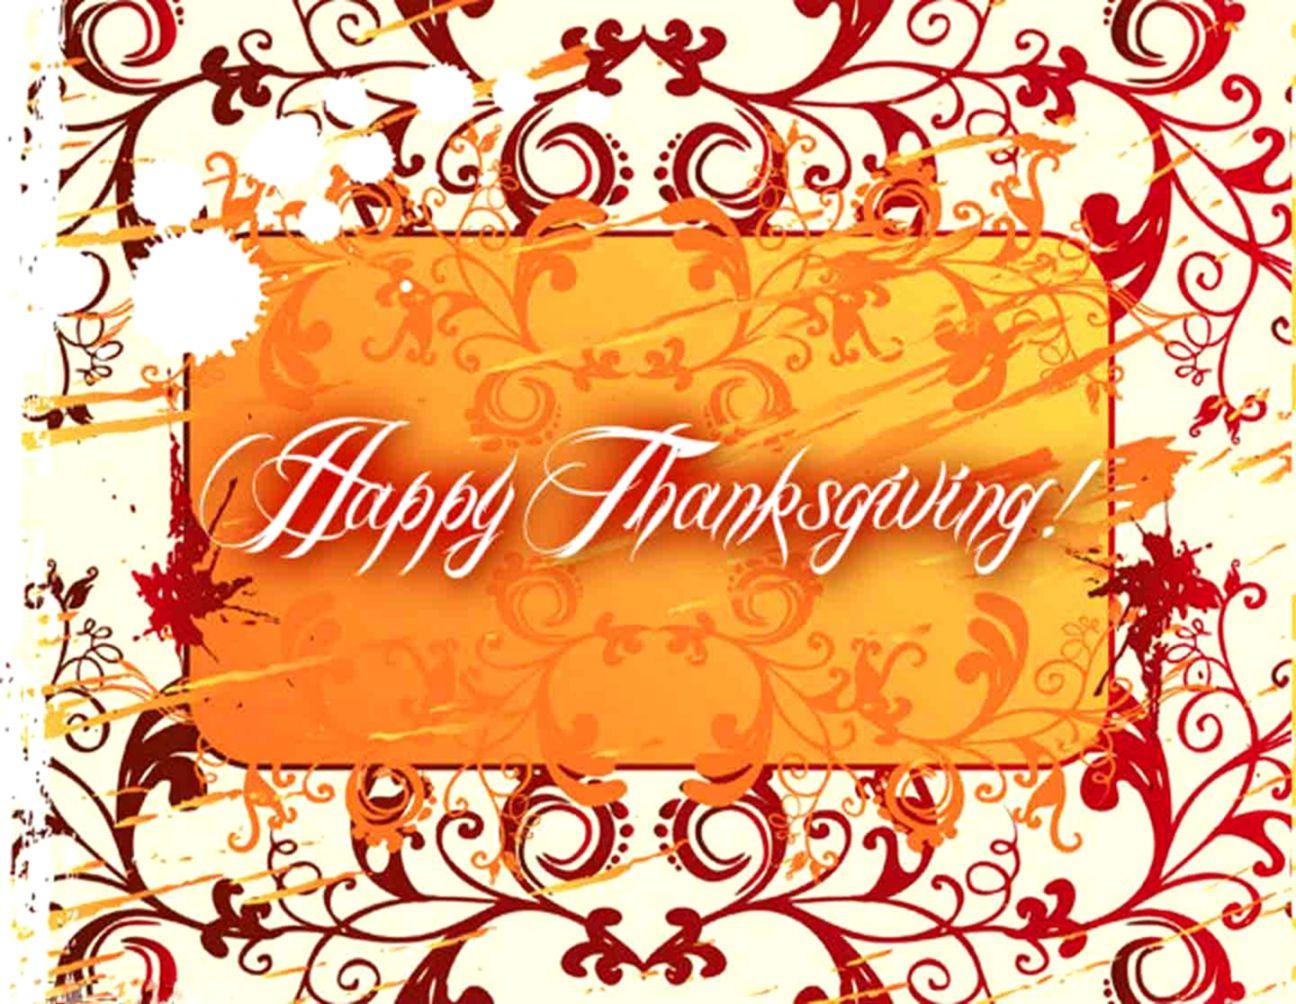 Happy Thanksgiving Wallpaper Wallpapers Genius